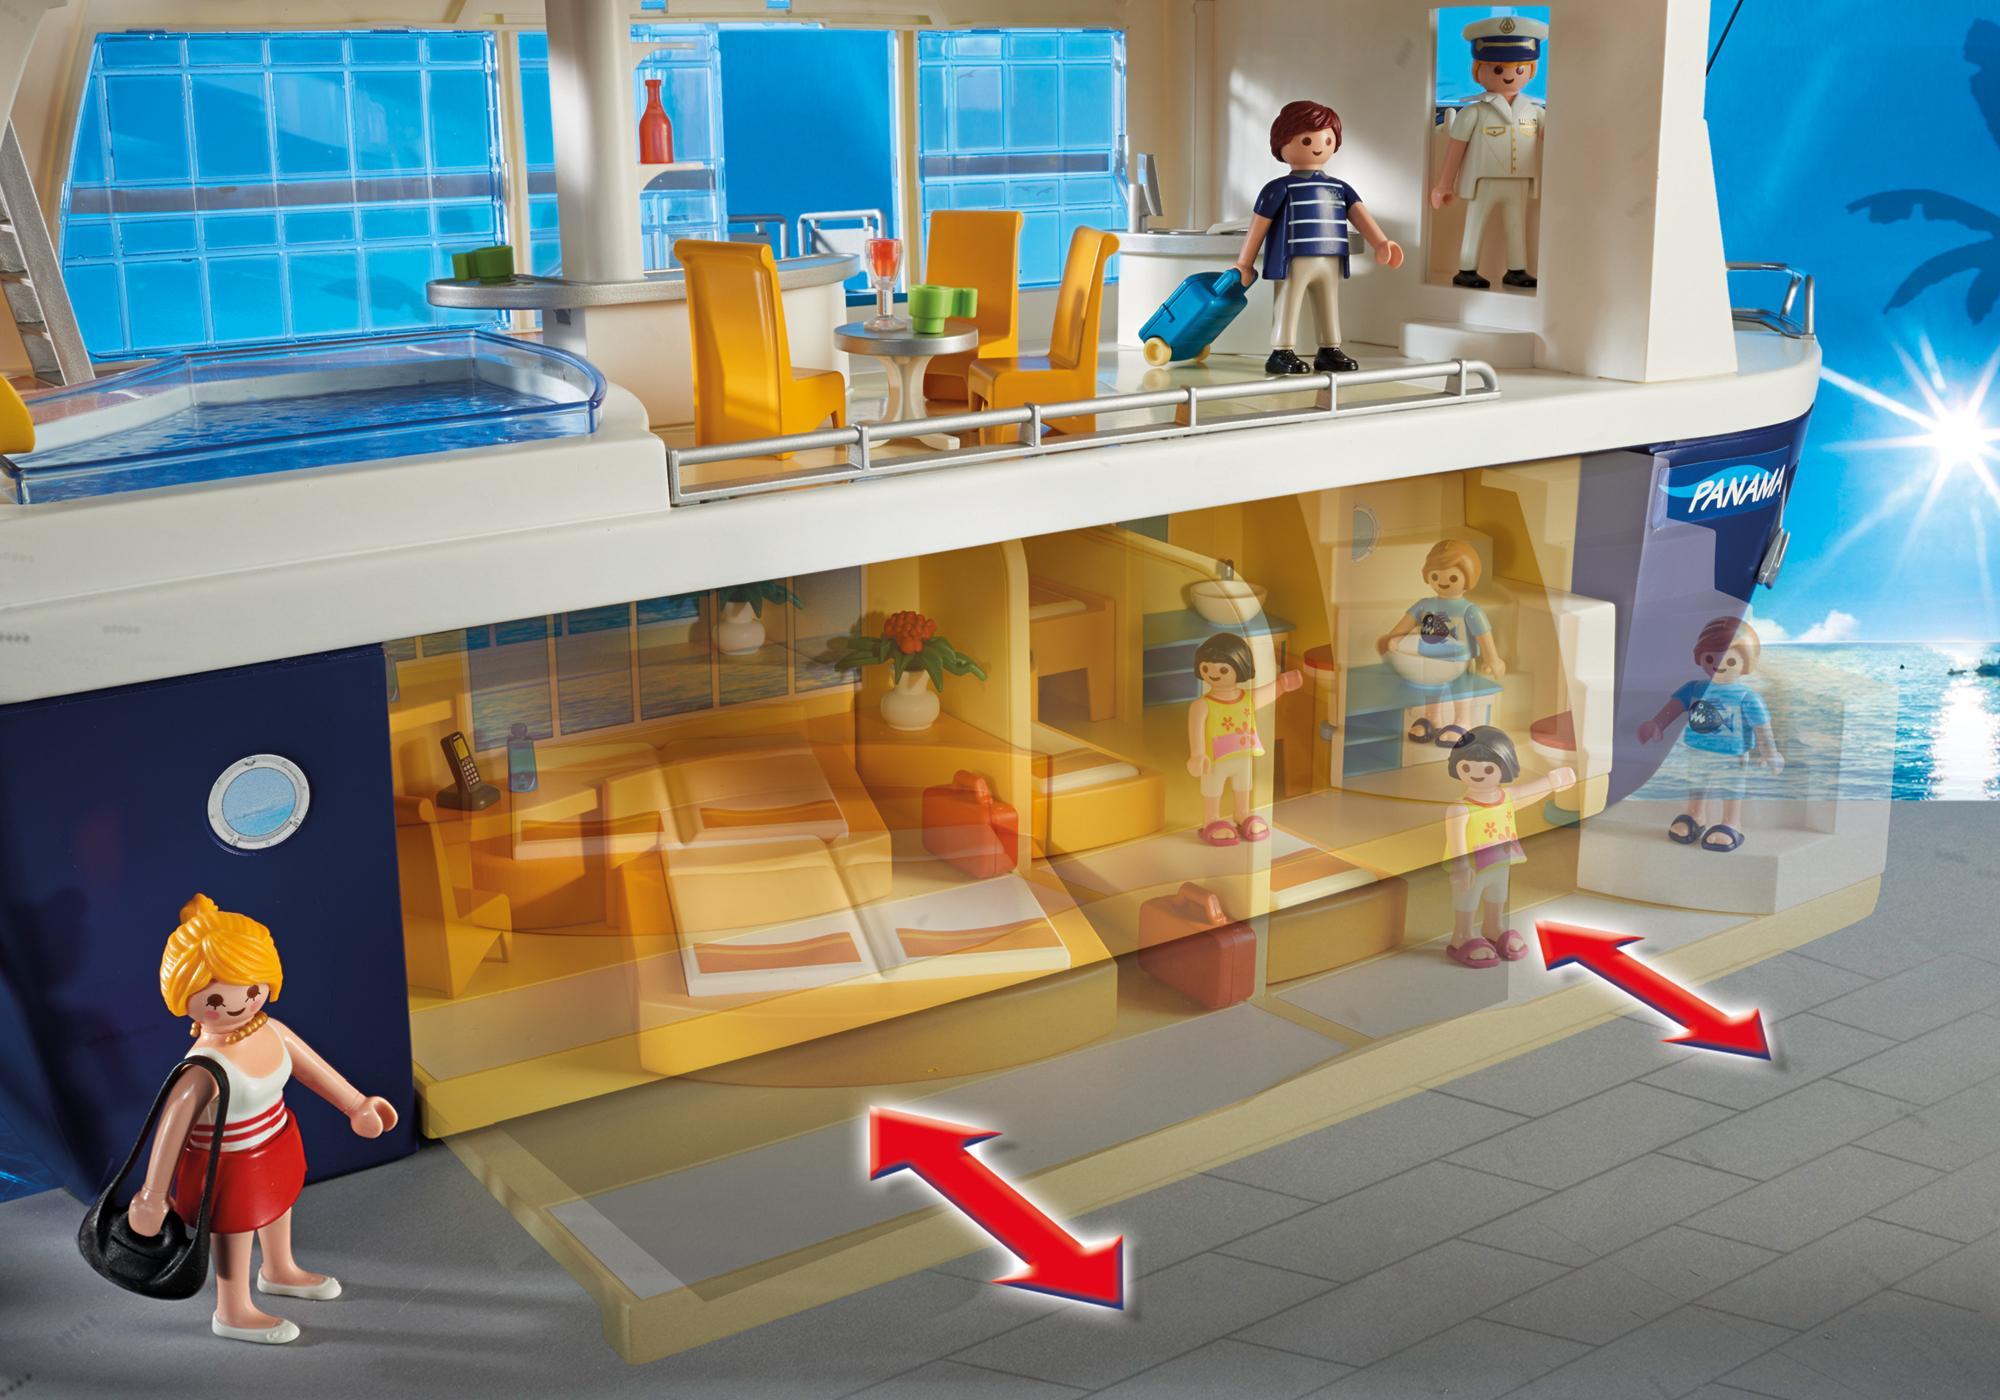 http://media.playmobil.com/i/playmobil/6978_product_extra1